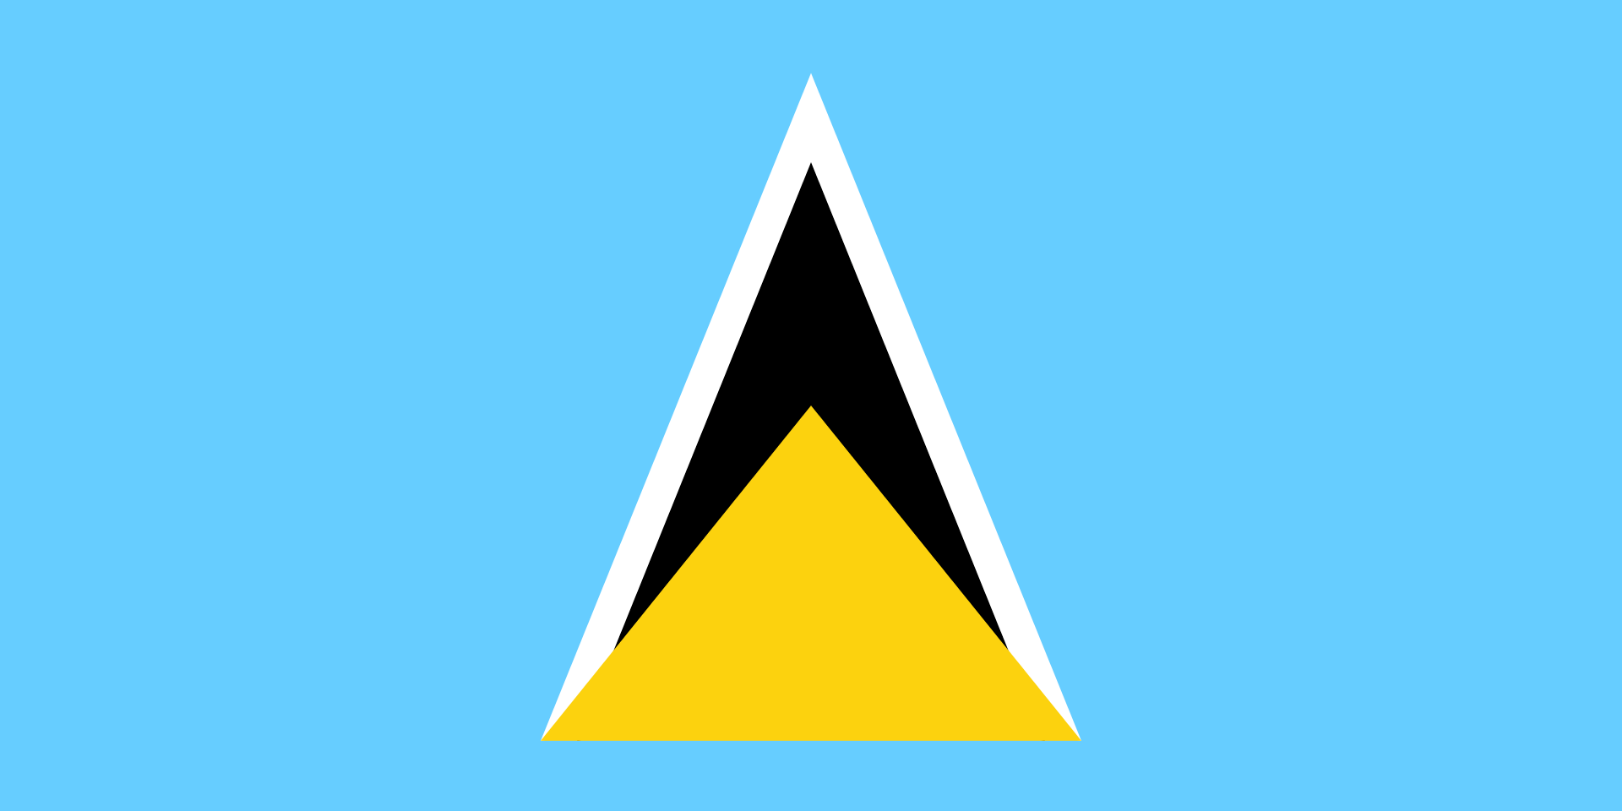 Flagge im Querformat Land St. Lucia 150x100 cm